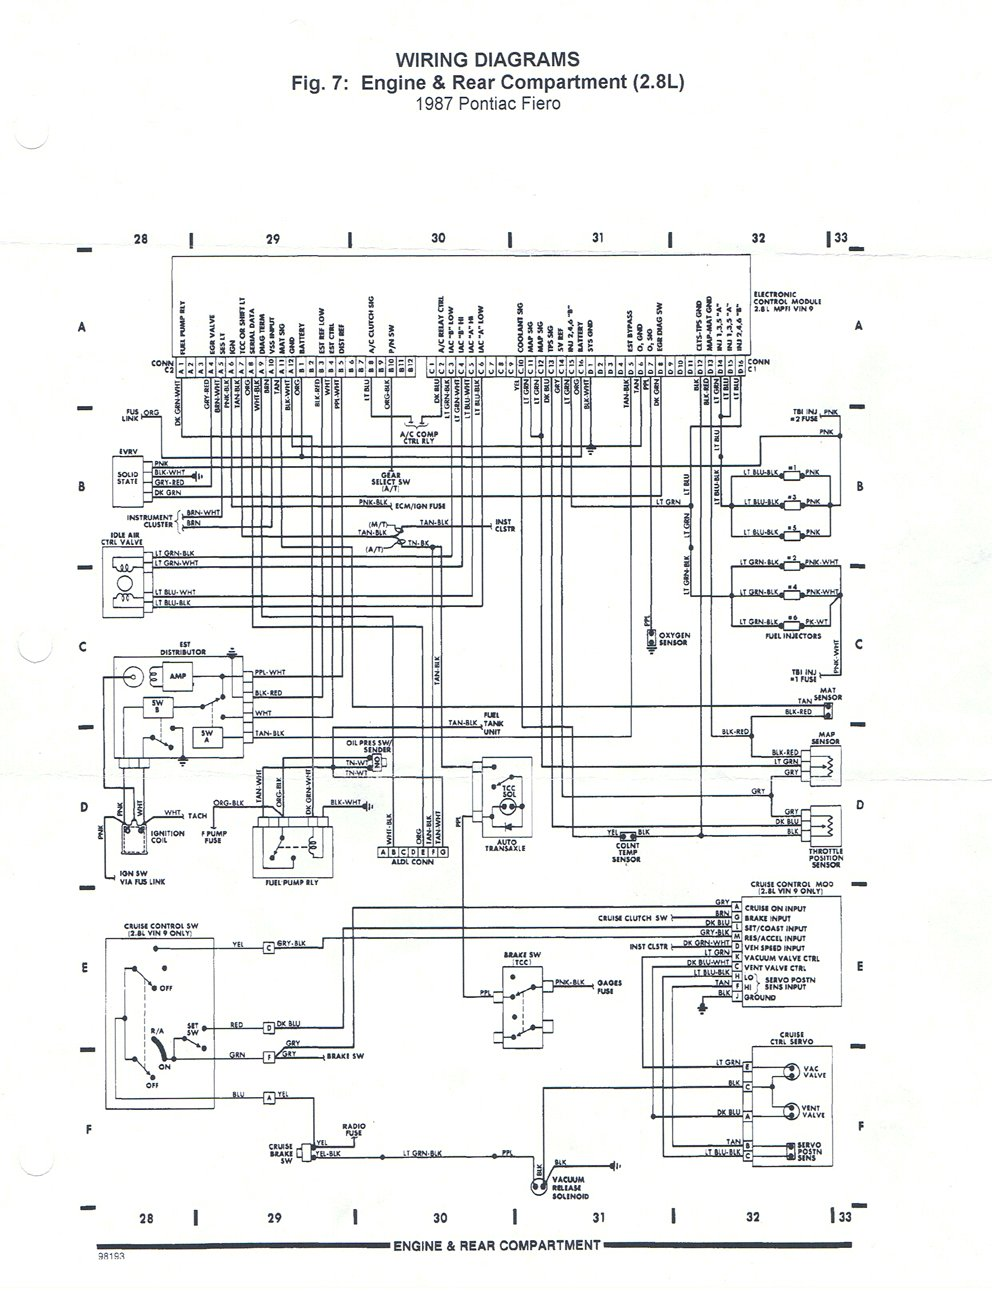 radeo for 1984 pontiac fiero fuse box 85 fiero fuse box